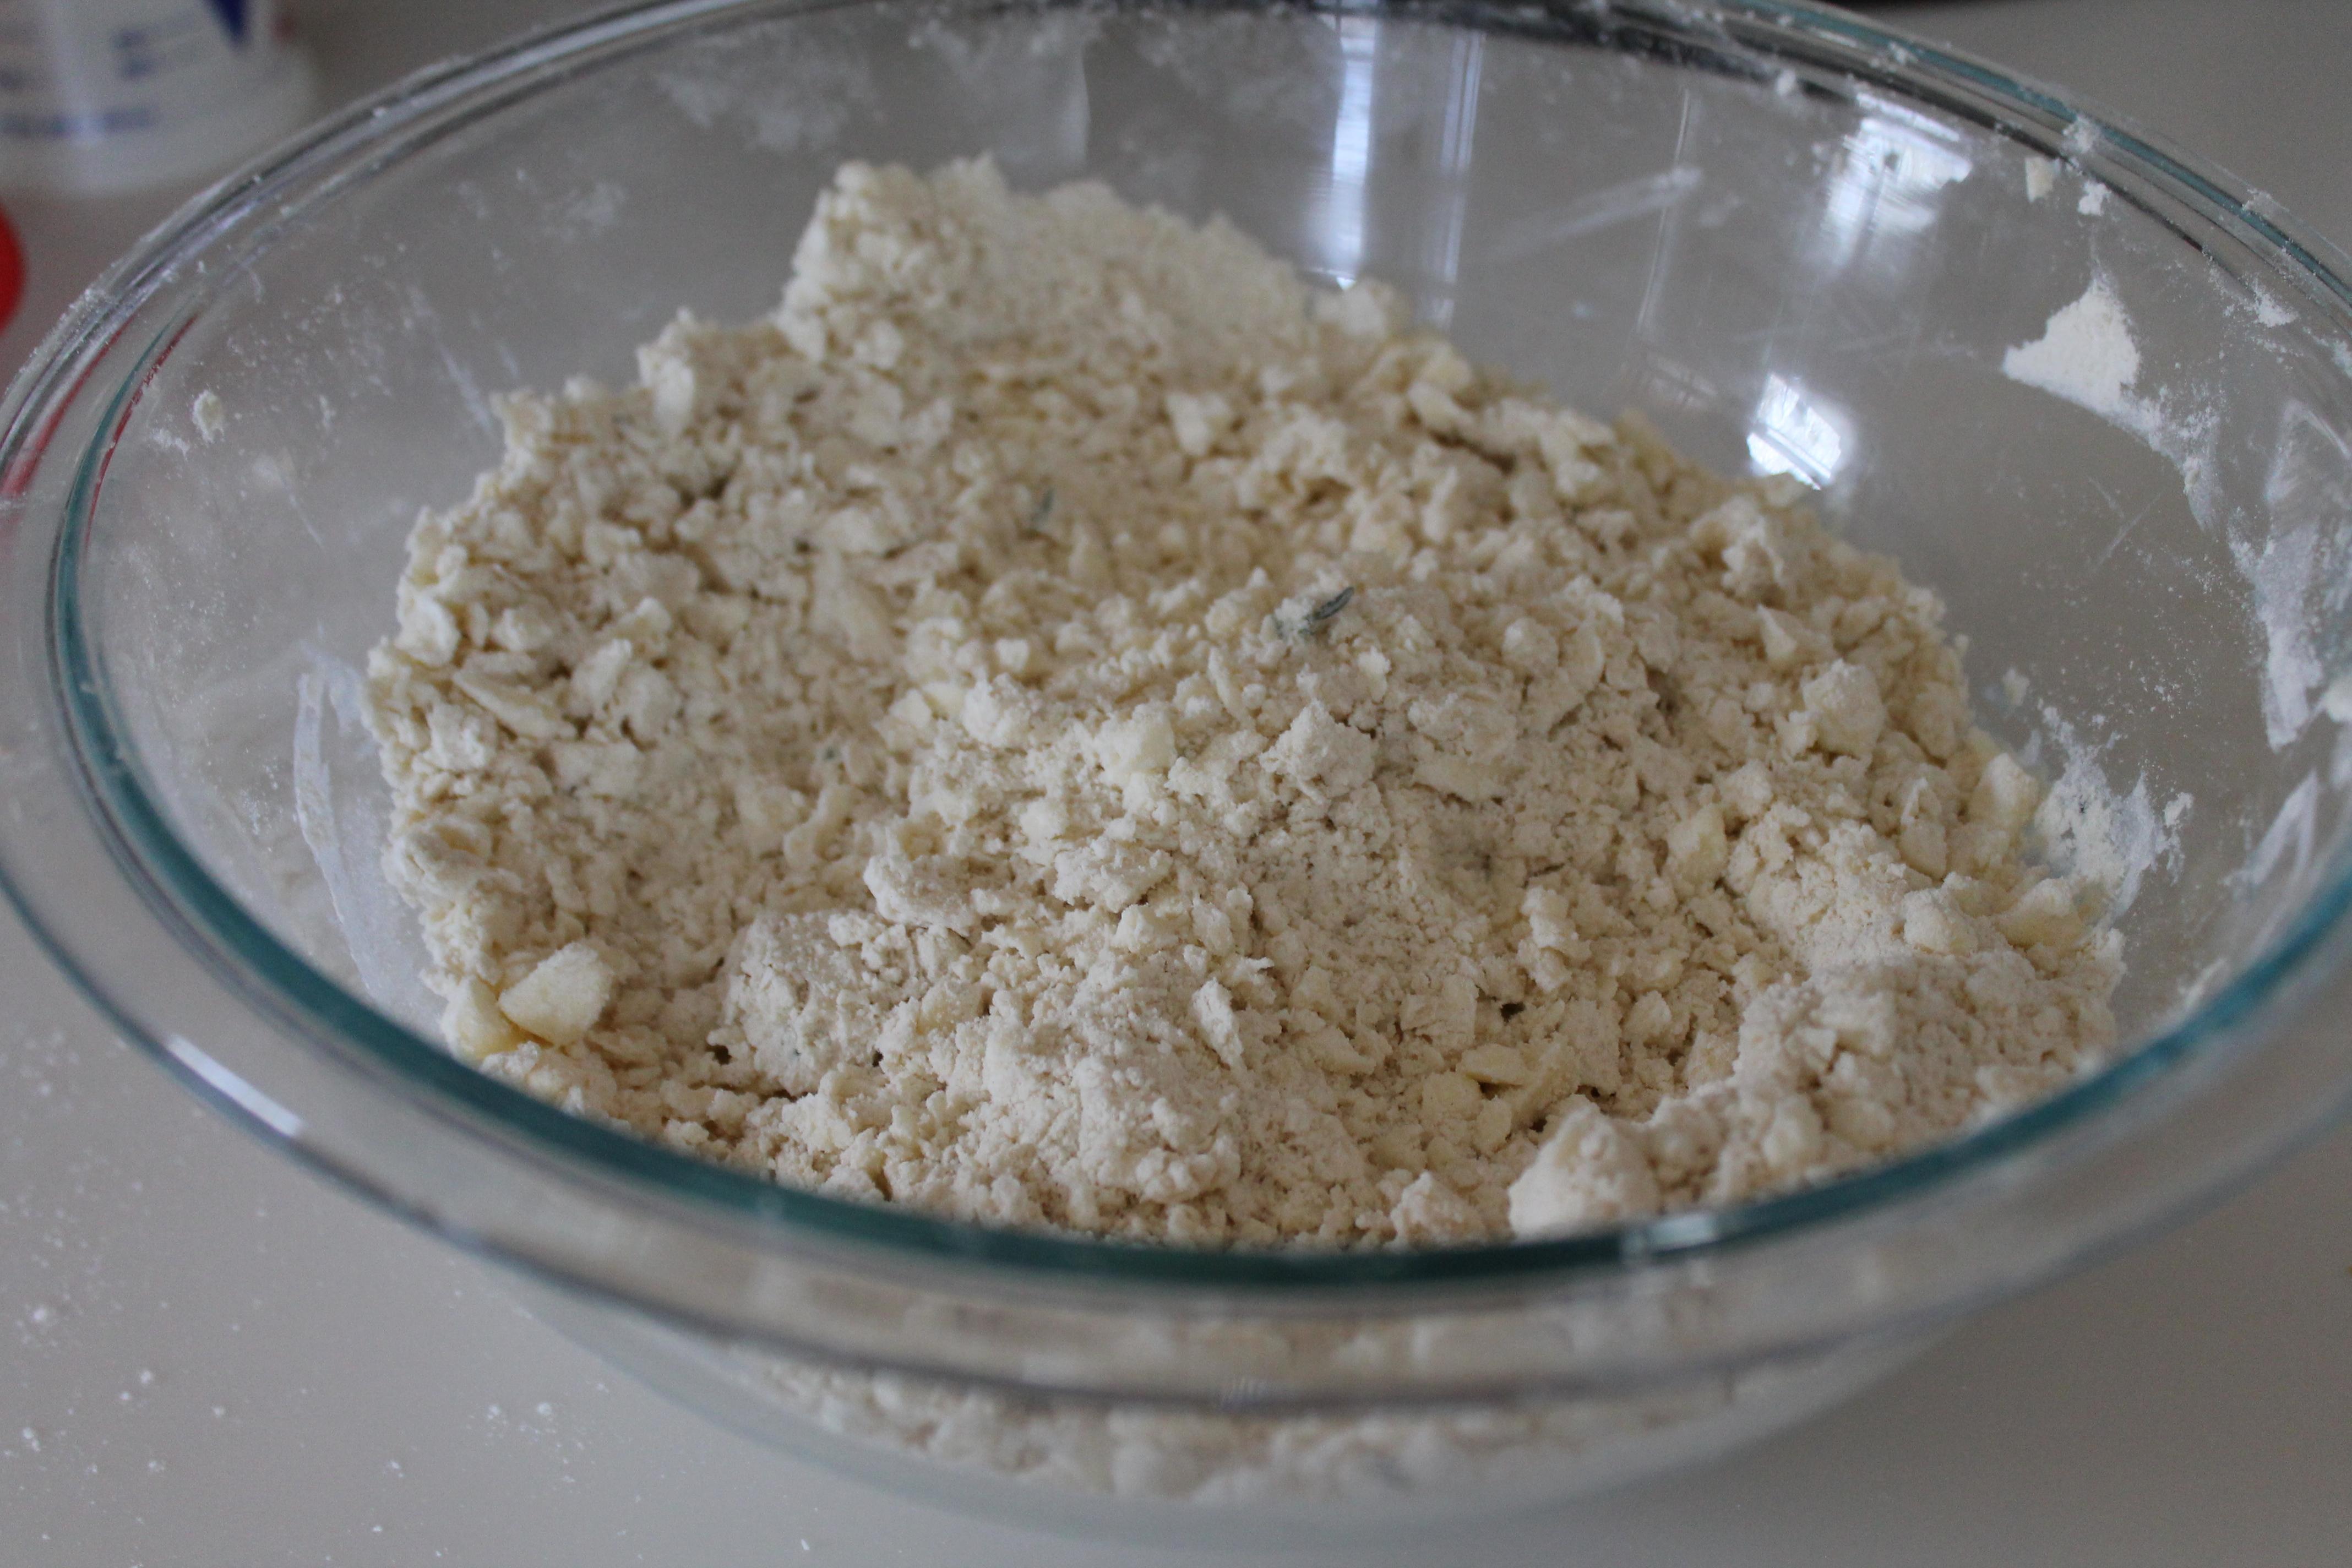 Soon-to-Be Tart Crust